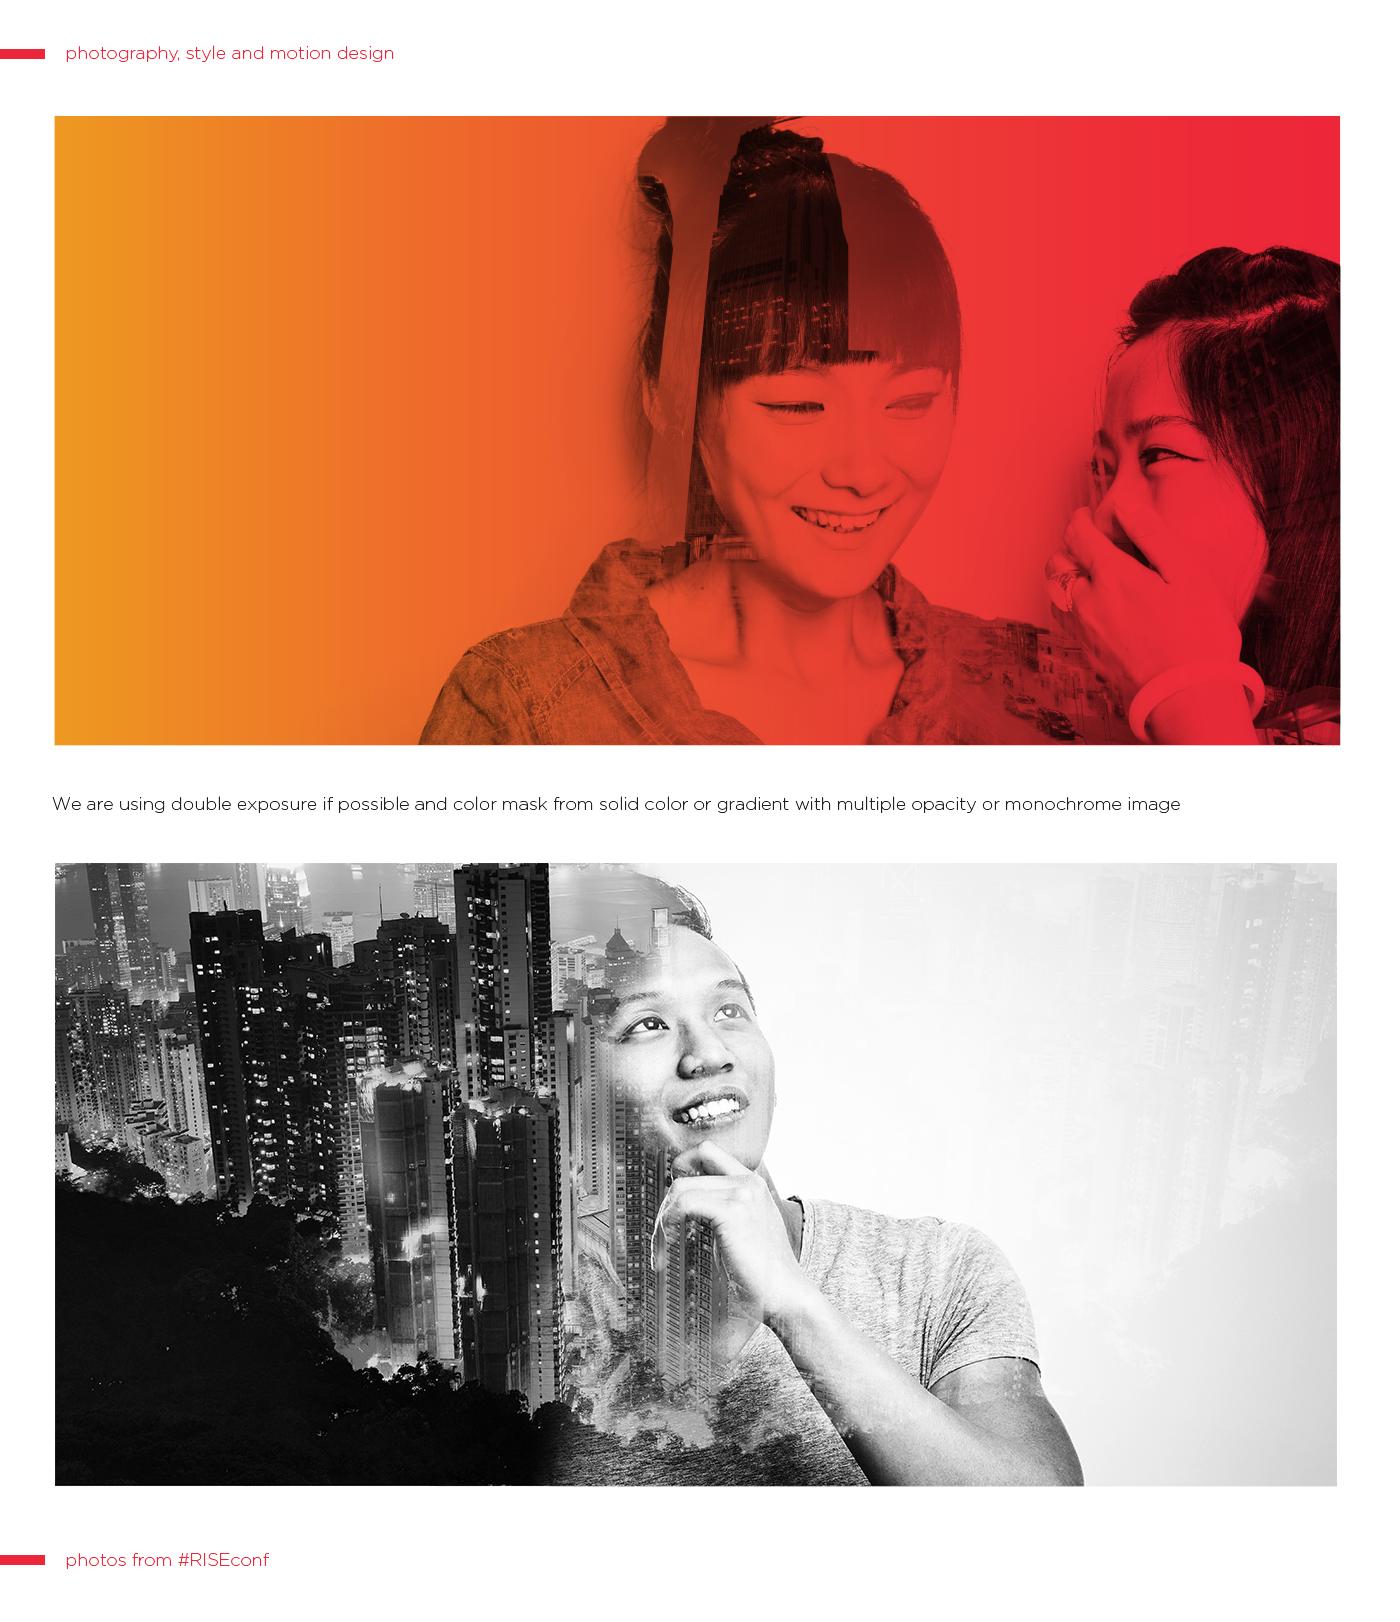 websummit riseconf hongkong asia Startup logo geometric Dynamic conference dublin Ireland fresh colors gradients shapes